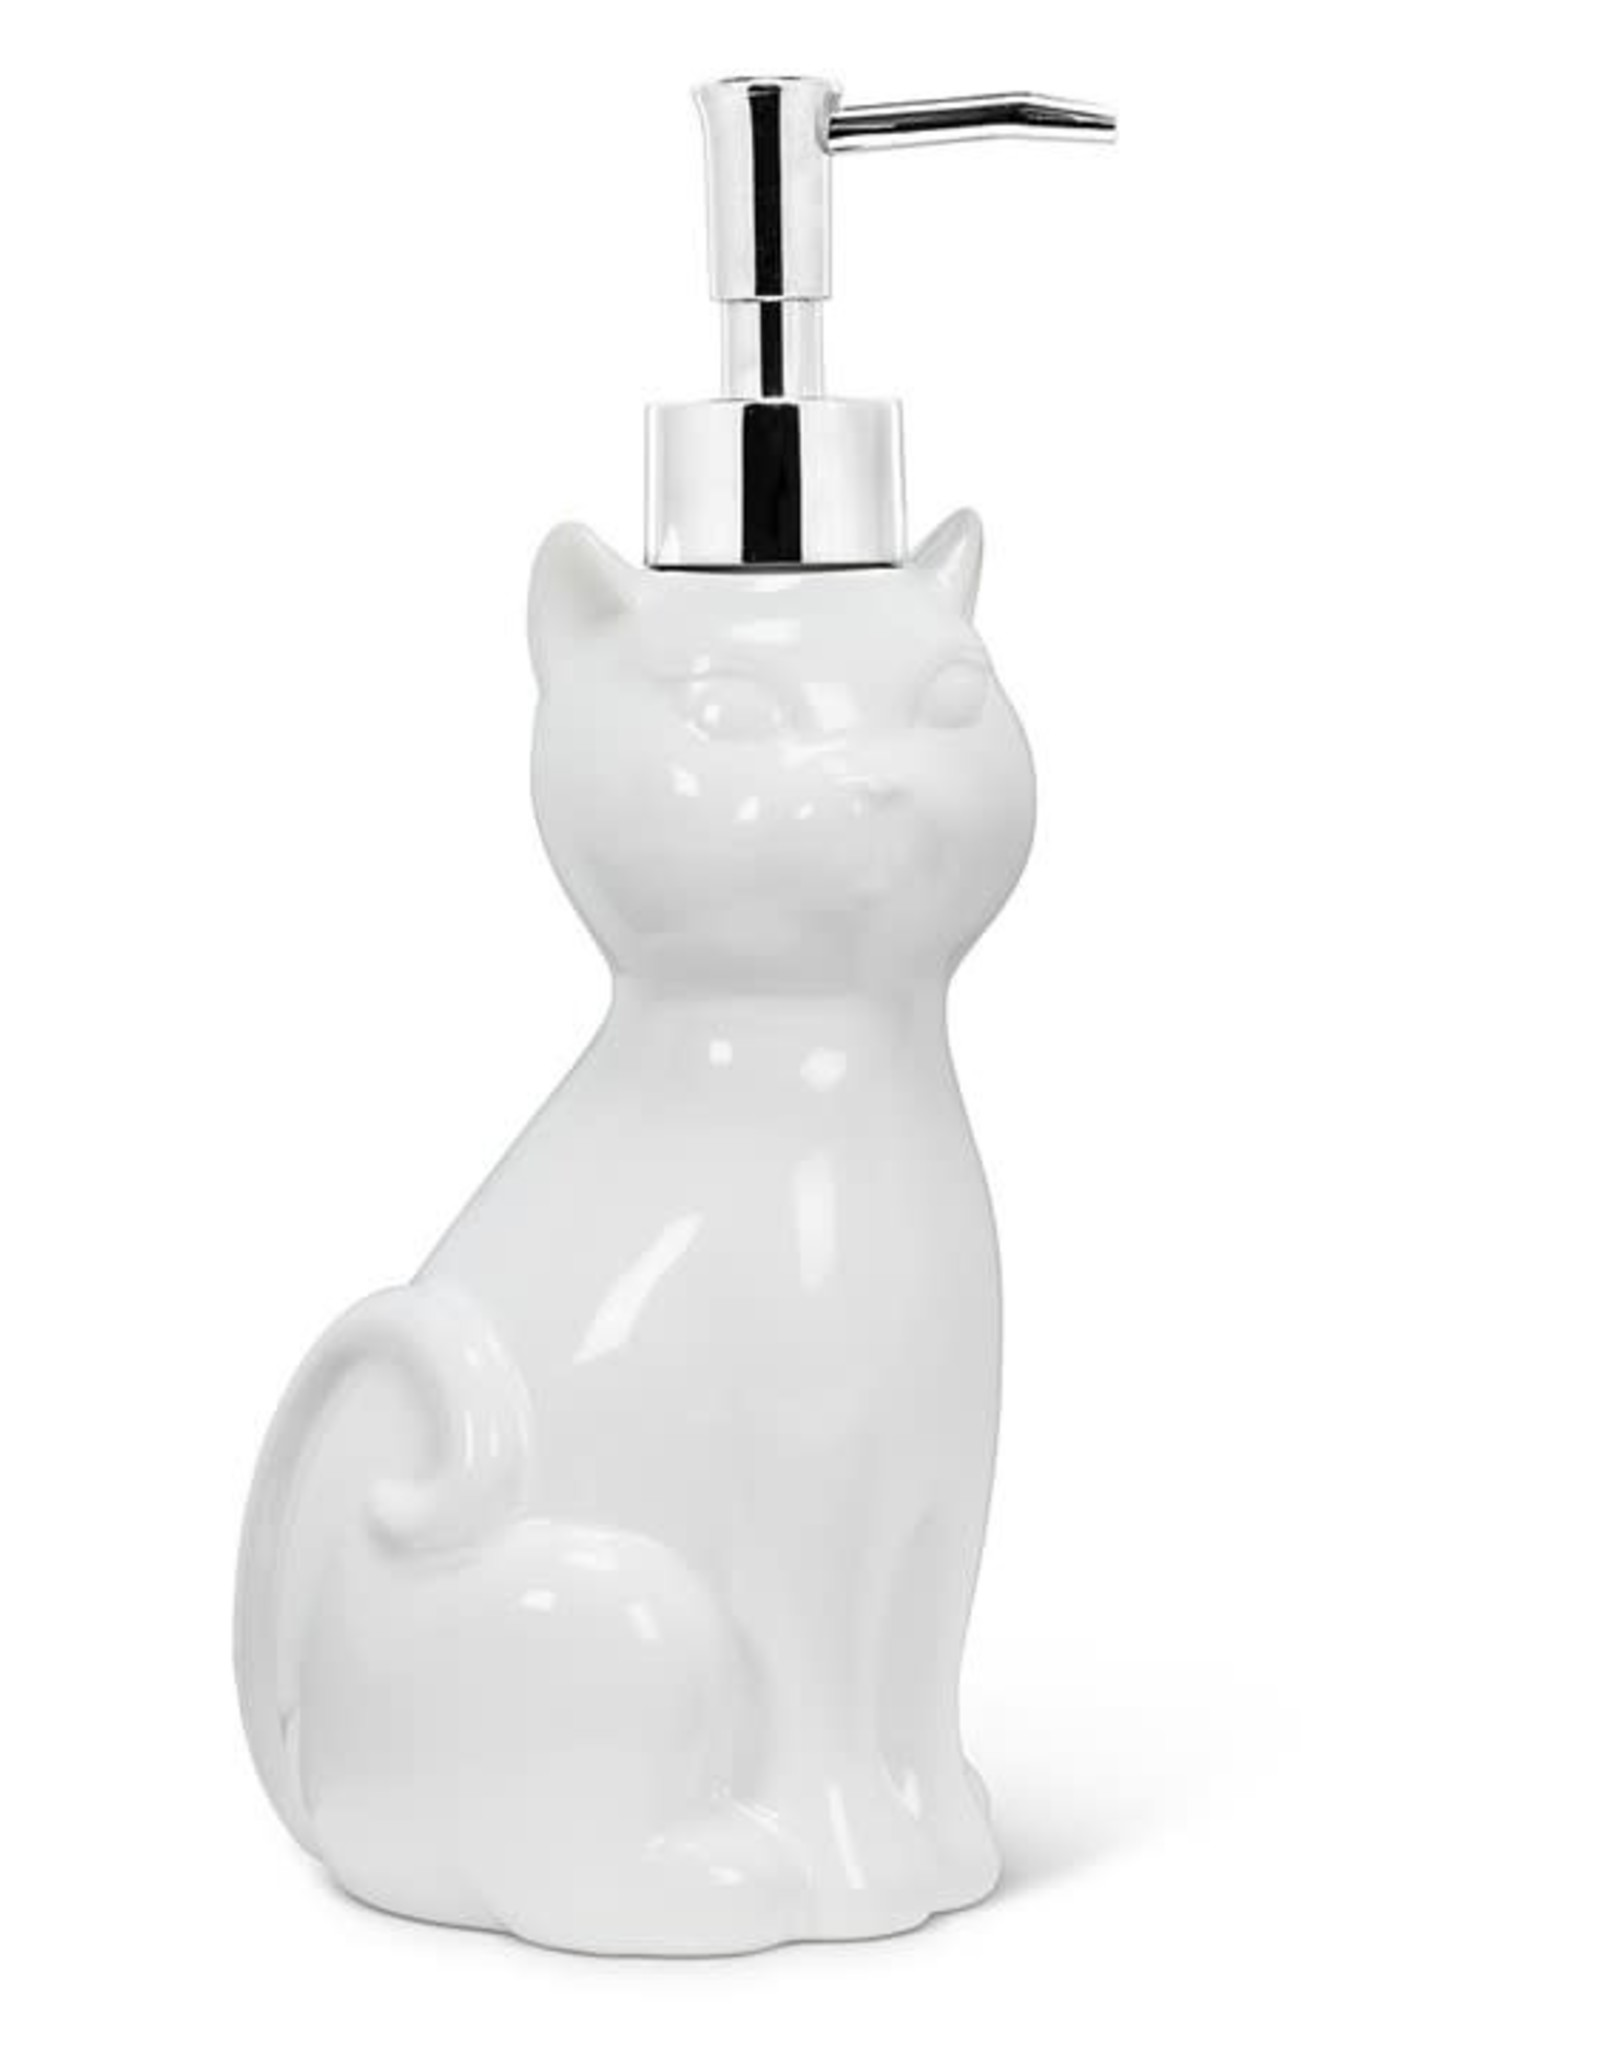 Pompe à savon chat